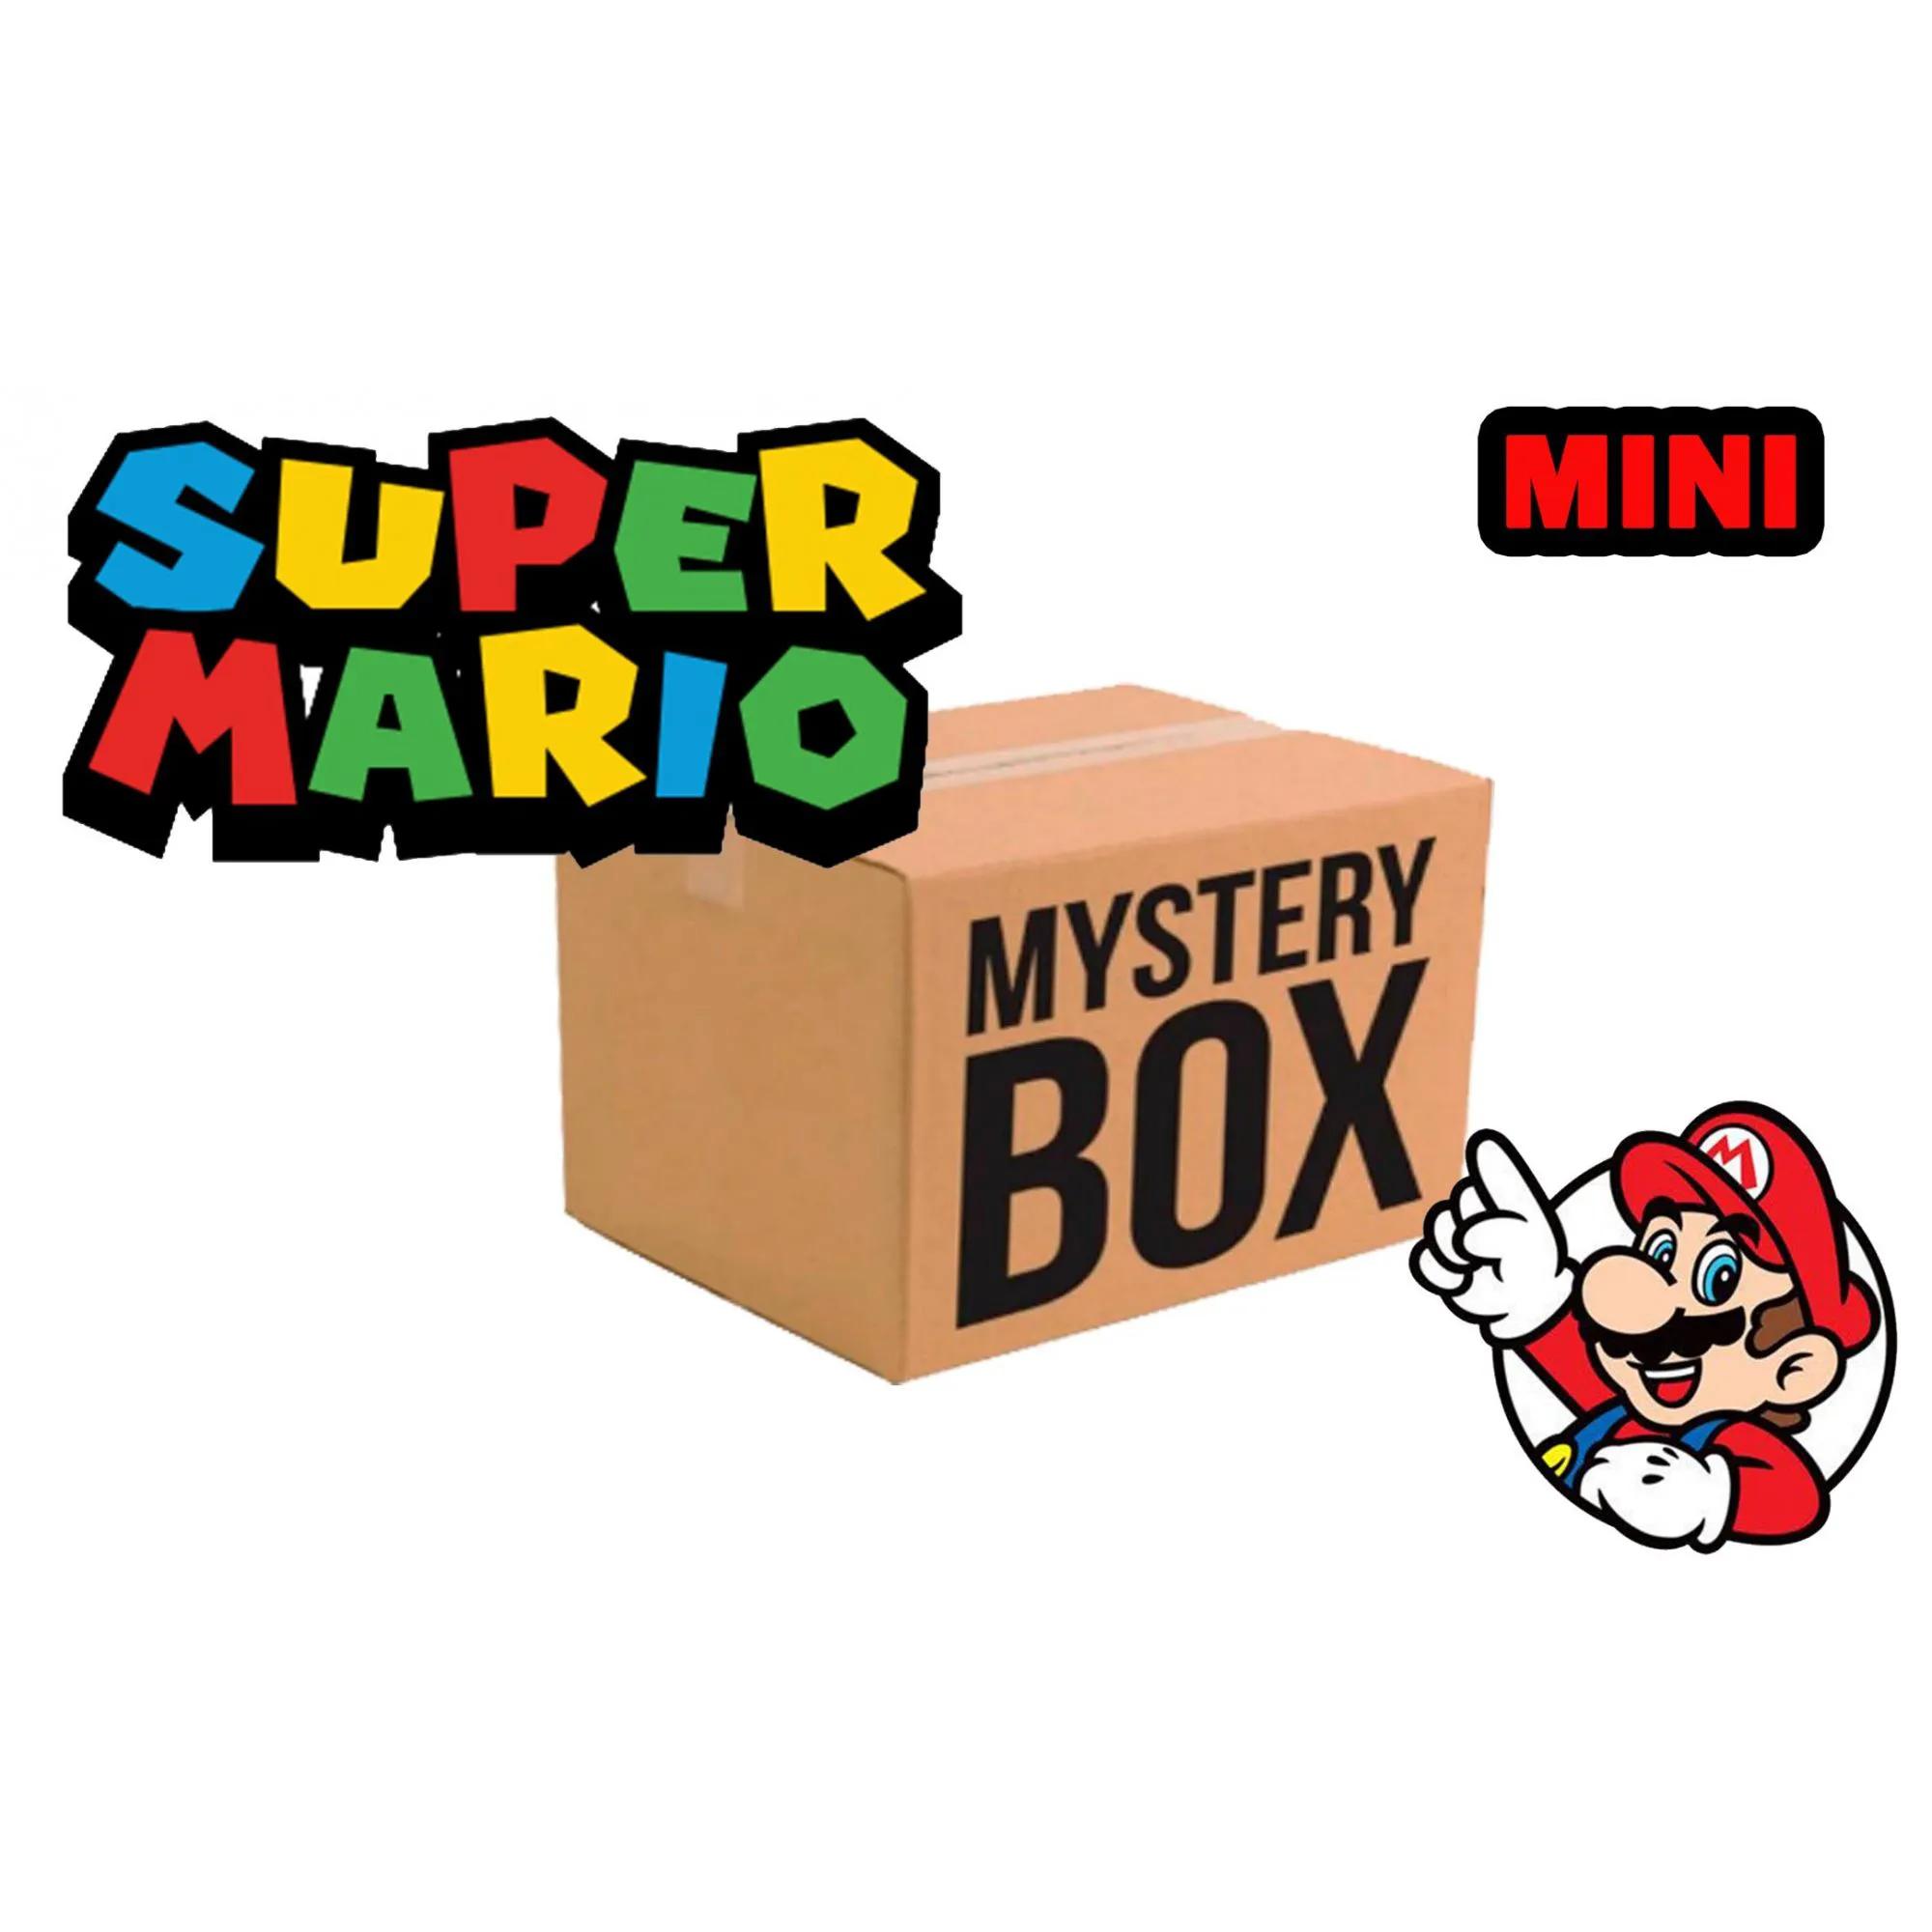 MINI CAIXA MISTERIOSA MYSTERY BOX SURPRESA SUPER MARIO BROS